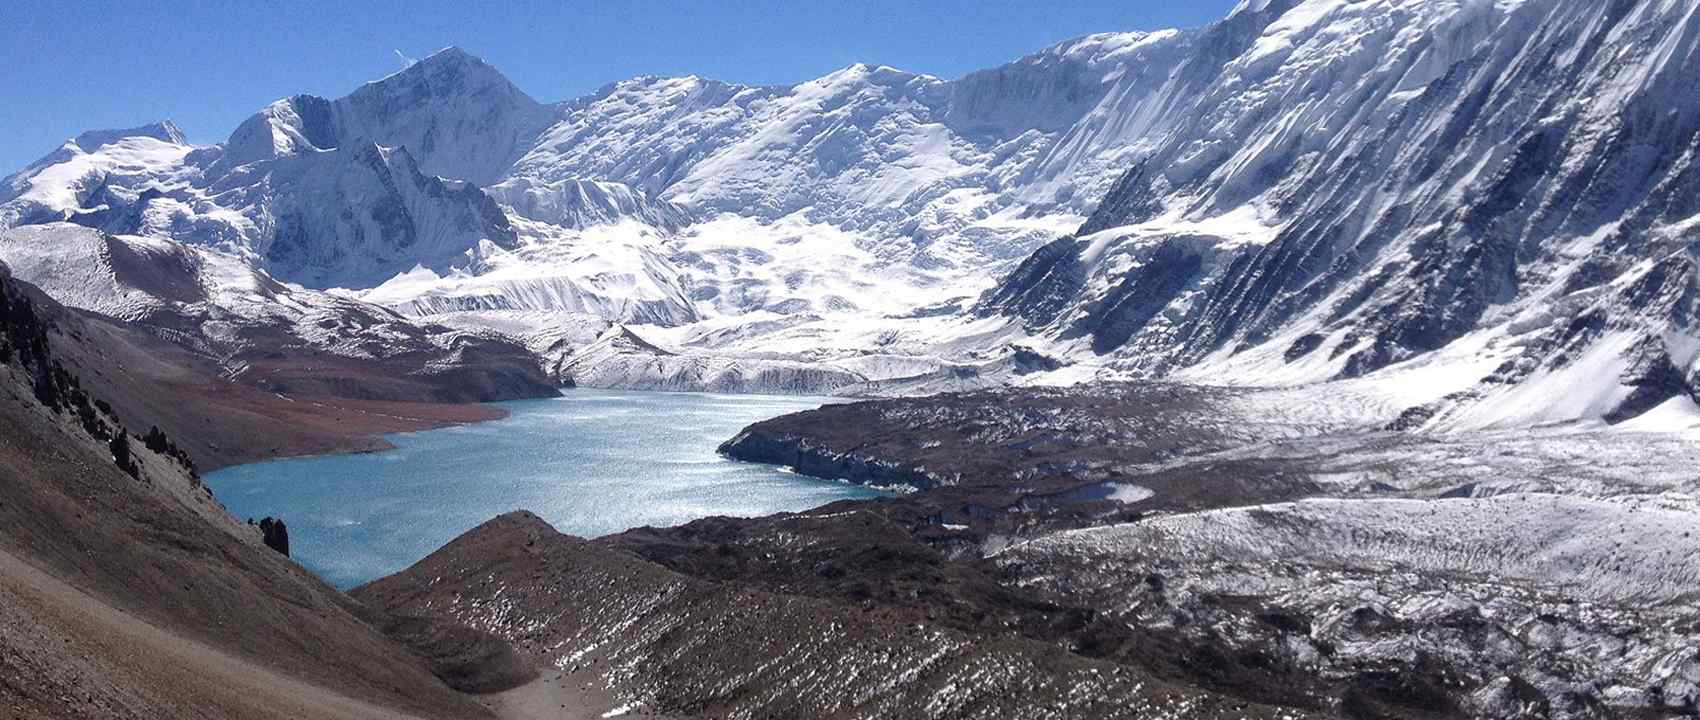 Annapurna Circuit with Tilicho Lake Trek In Nepal